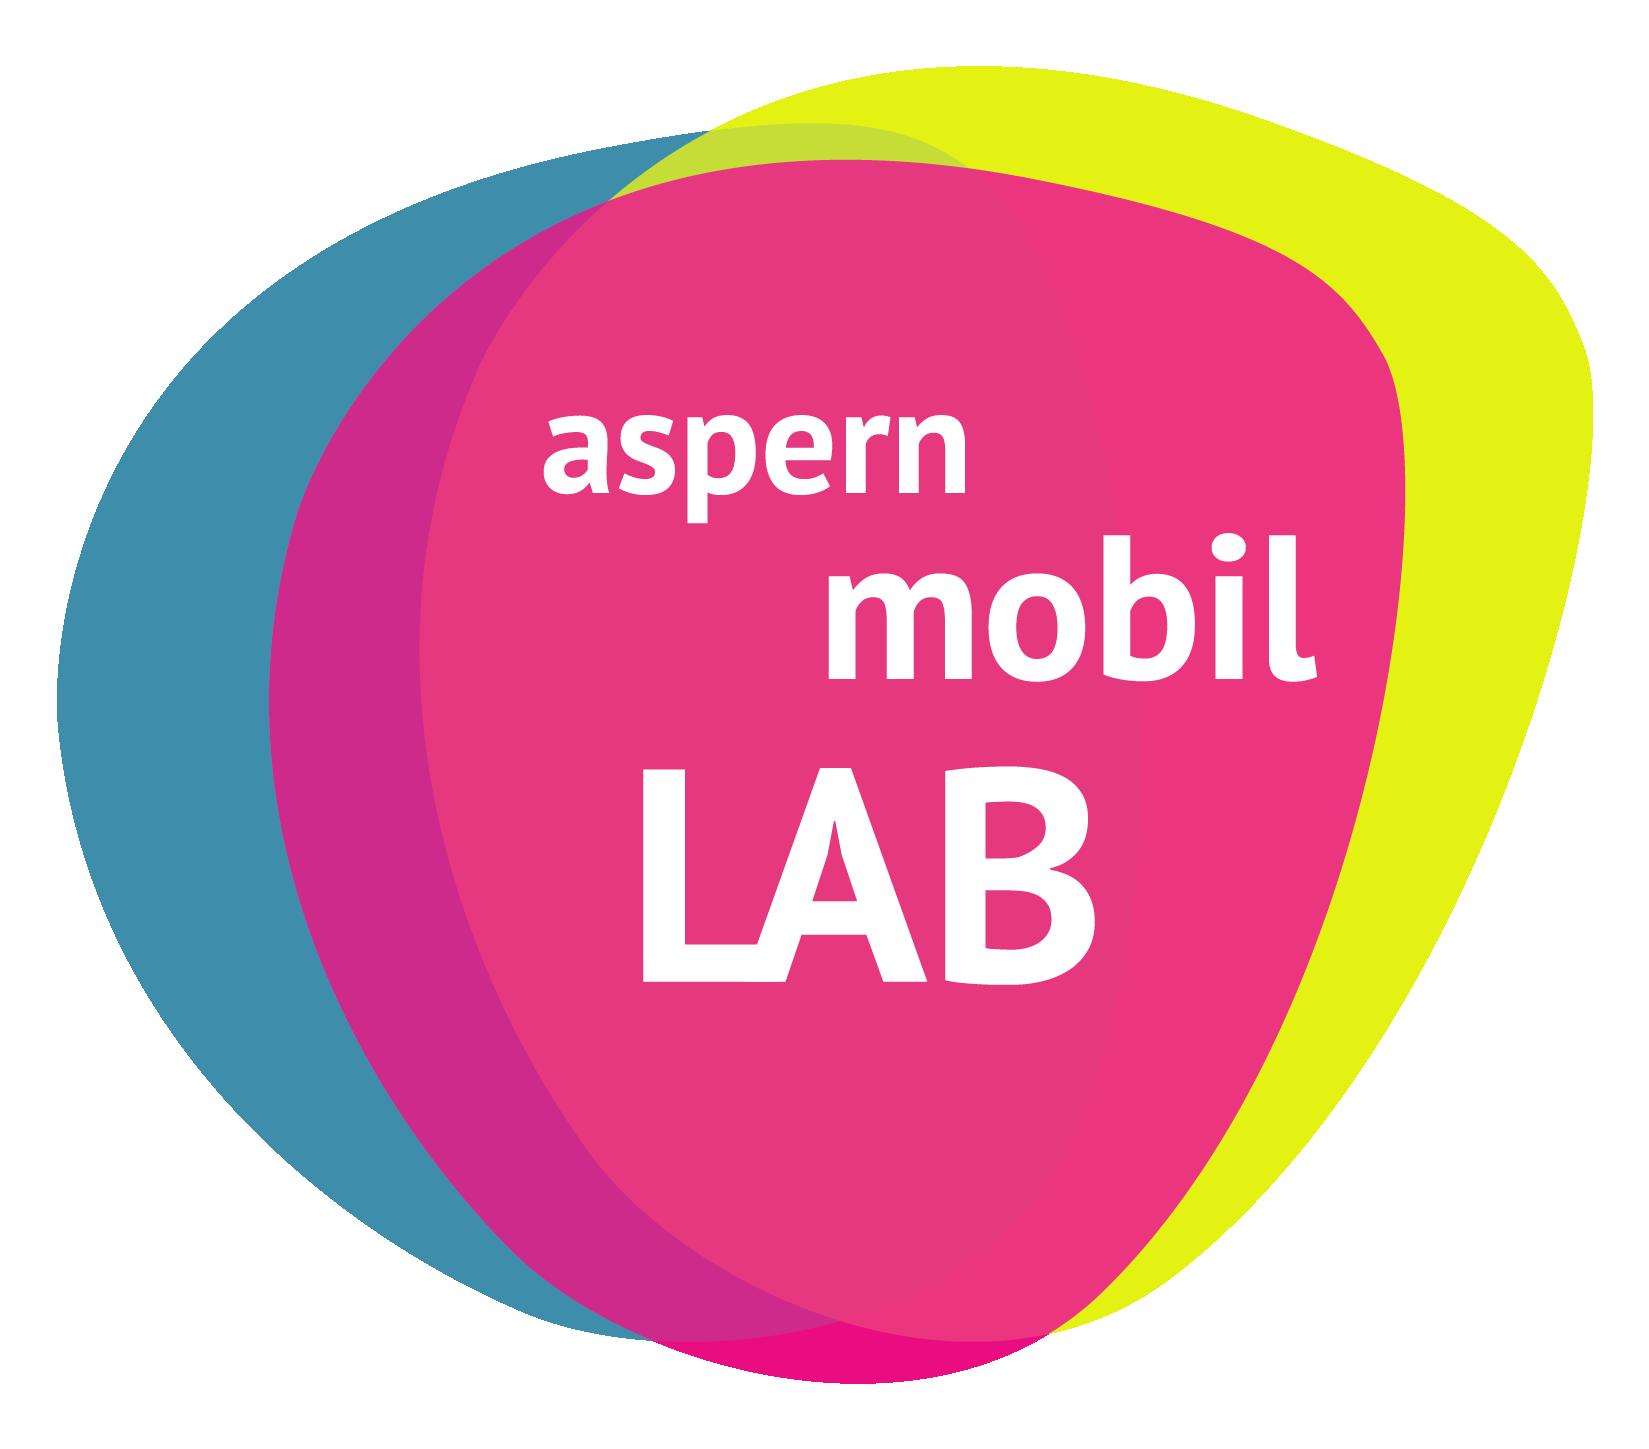 Logo aspern.mobil LAB